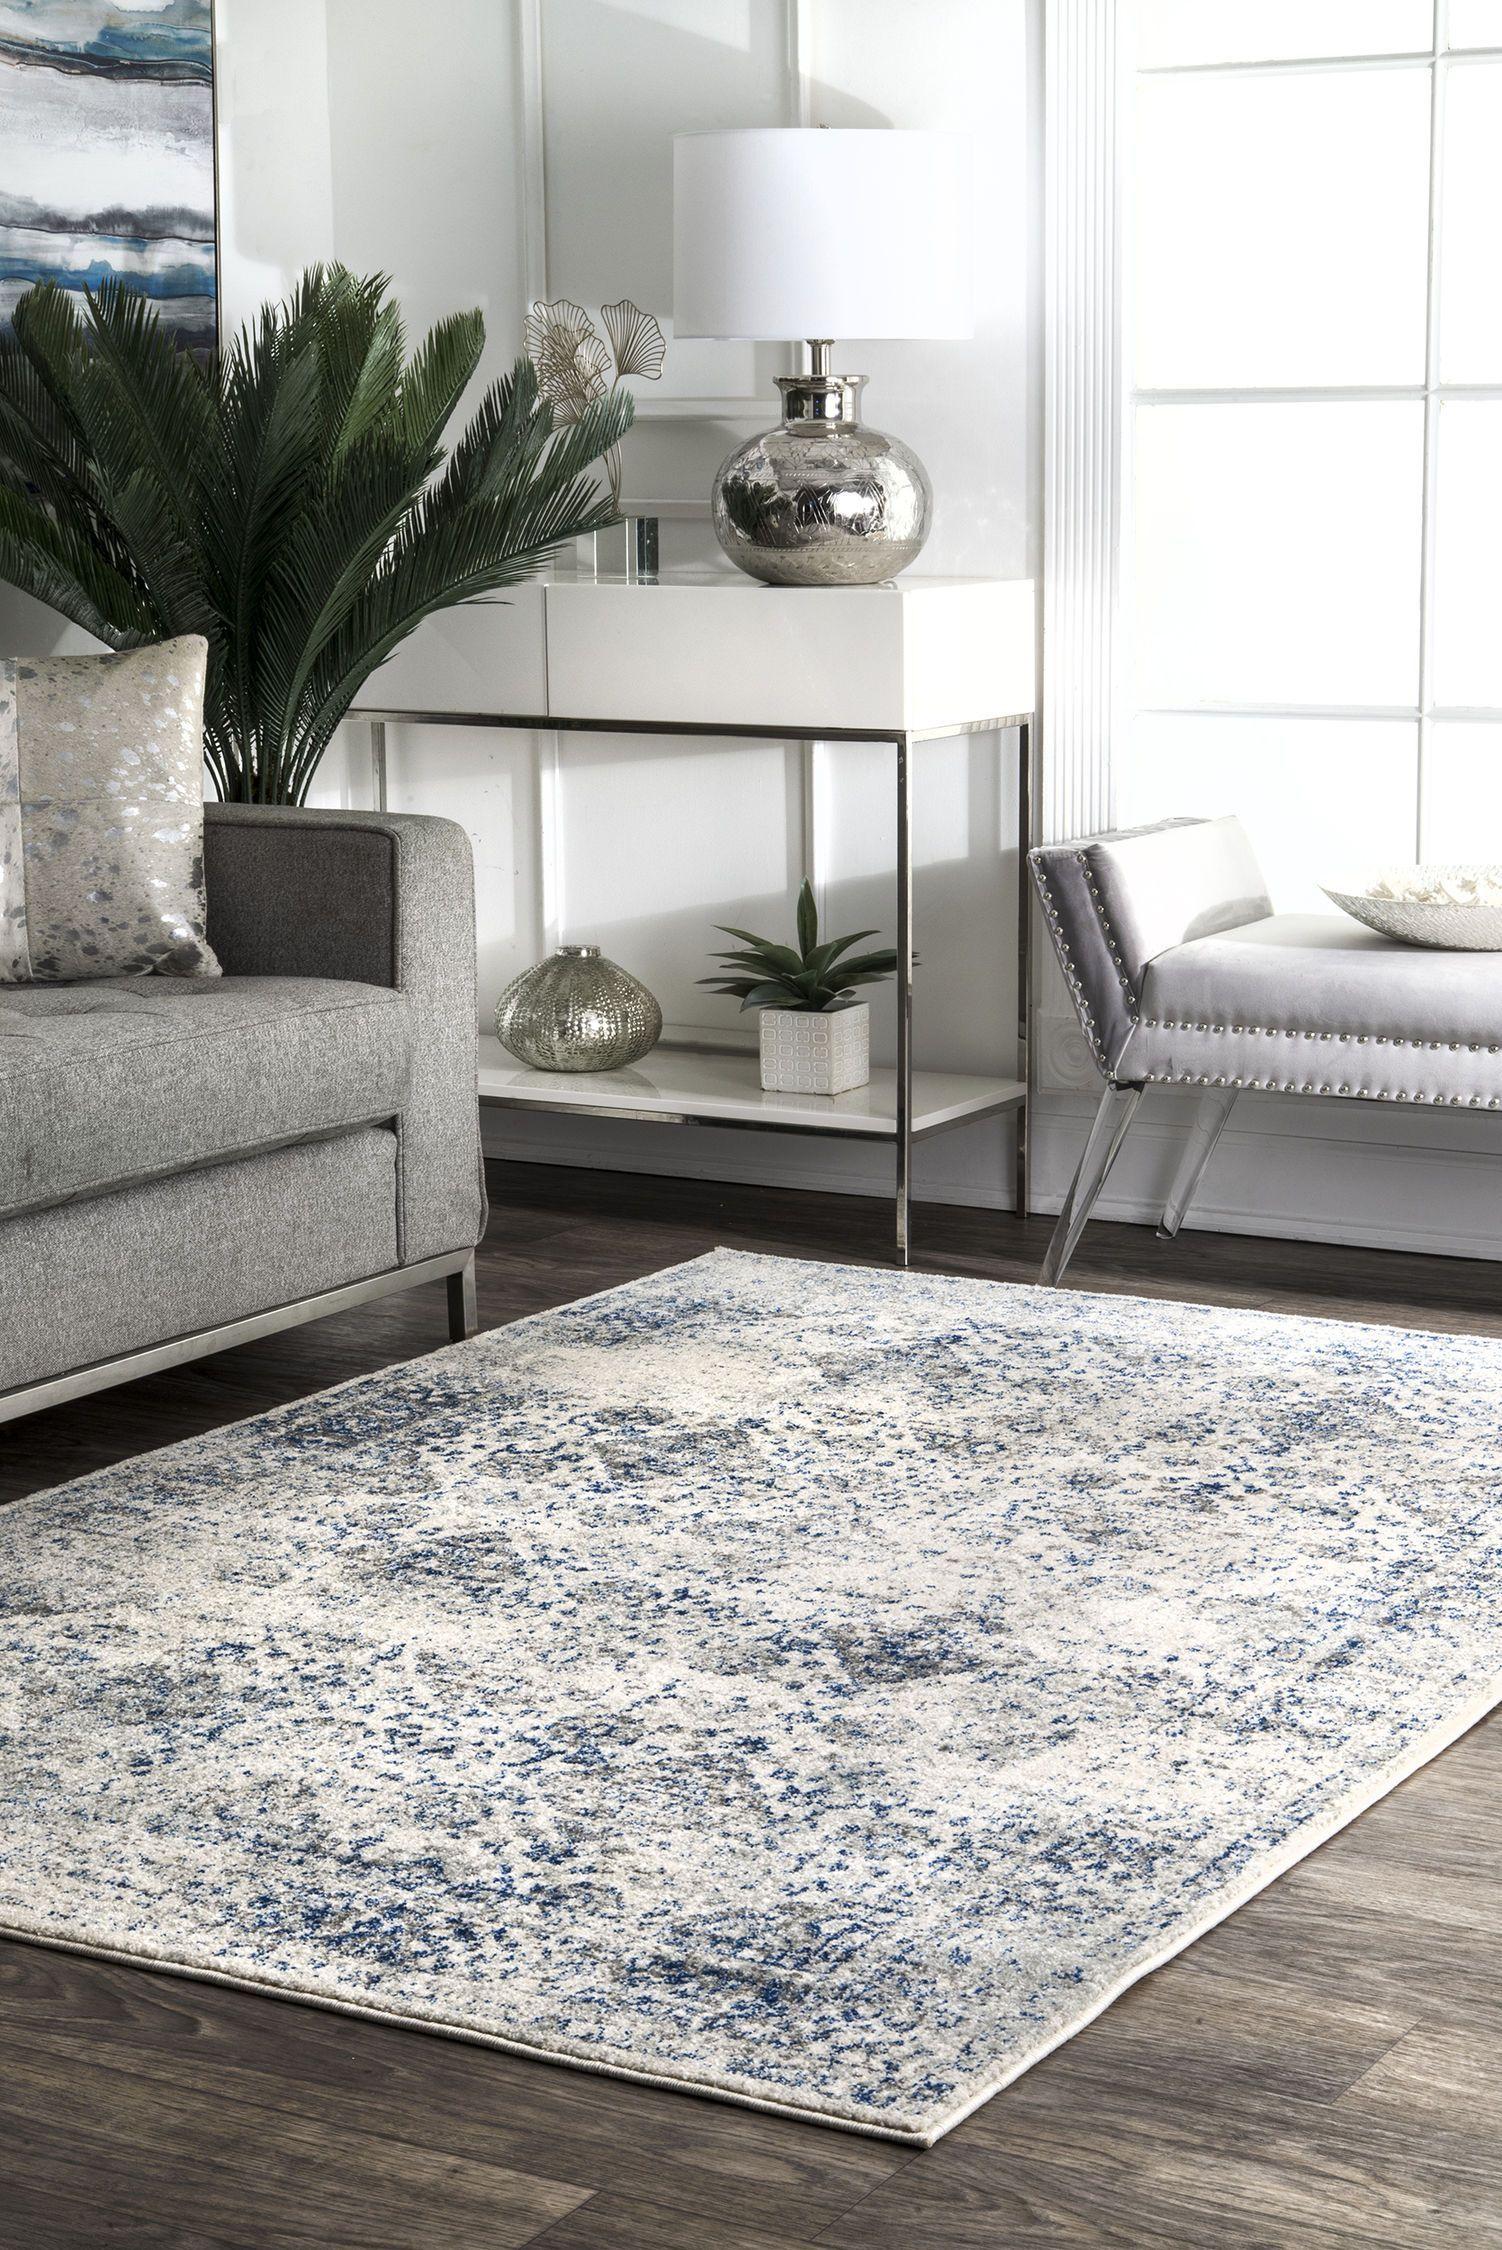 Pin On Resilient Vinyl Flooring X living room rugs